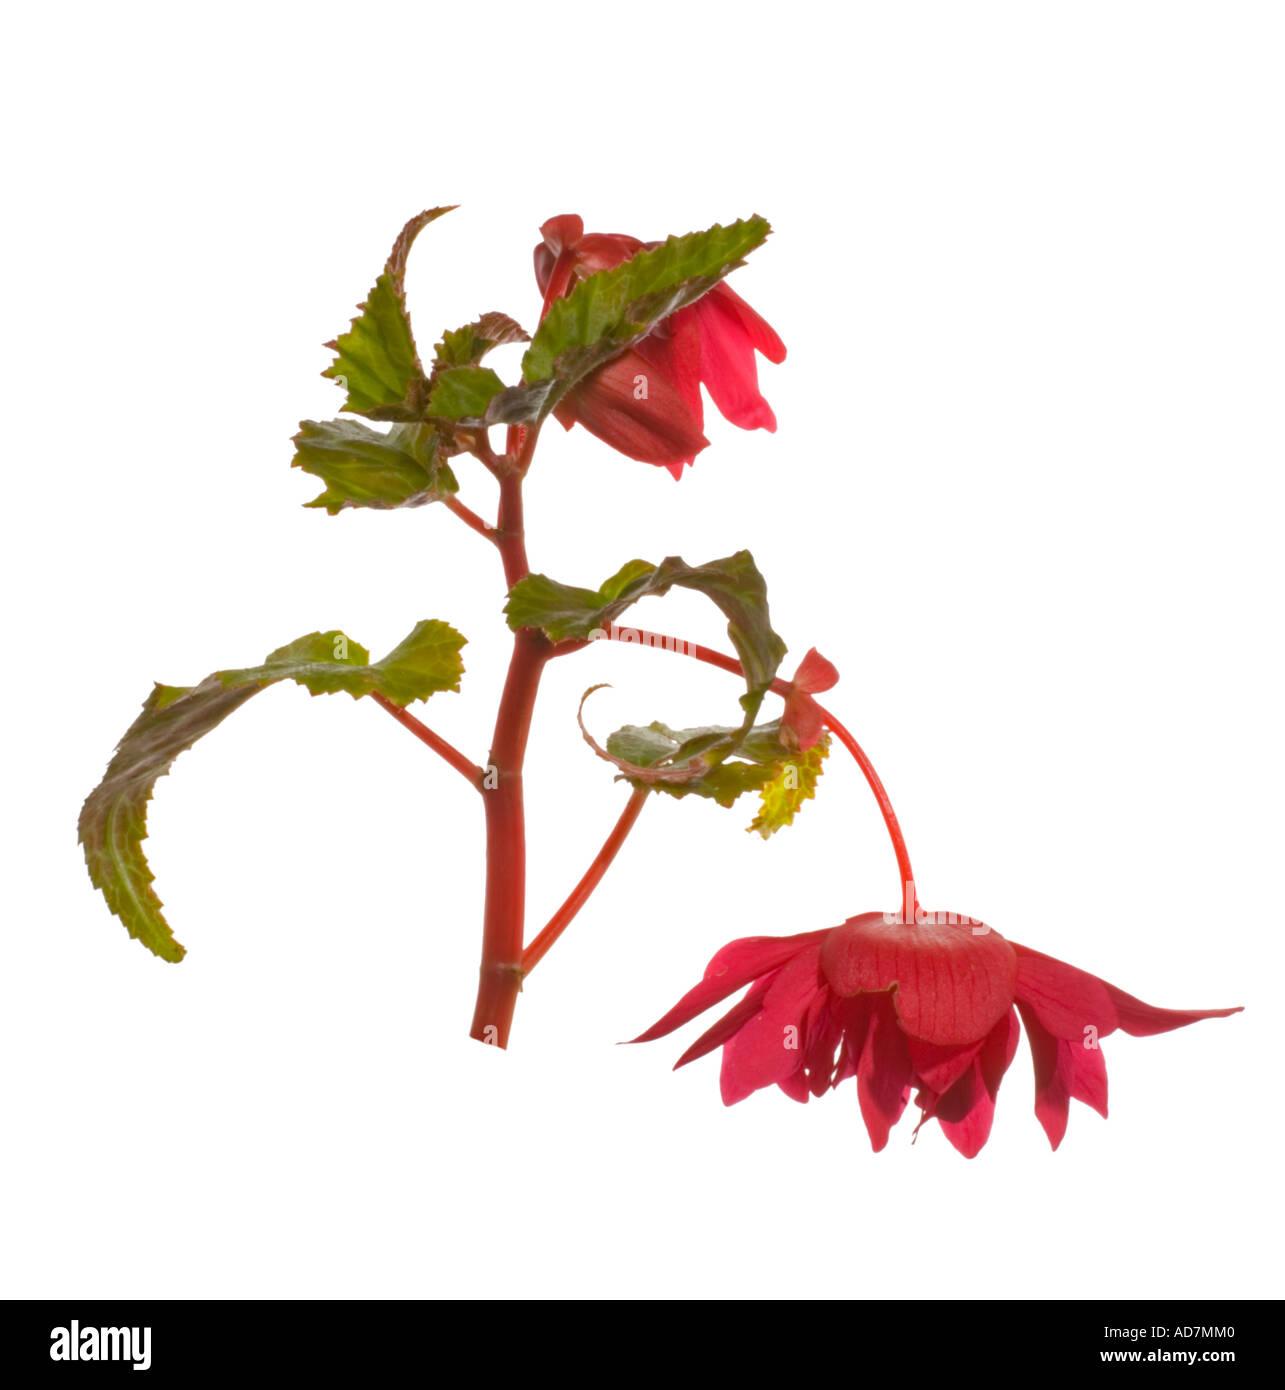 Begonia pendula. Flowerhead leaf bud Surrey England June - Stock Image